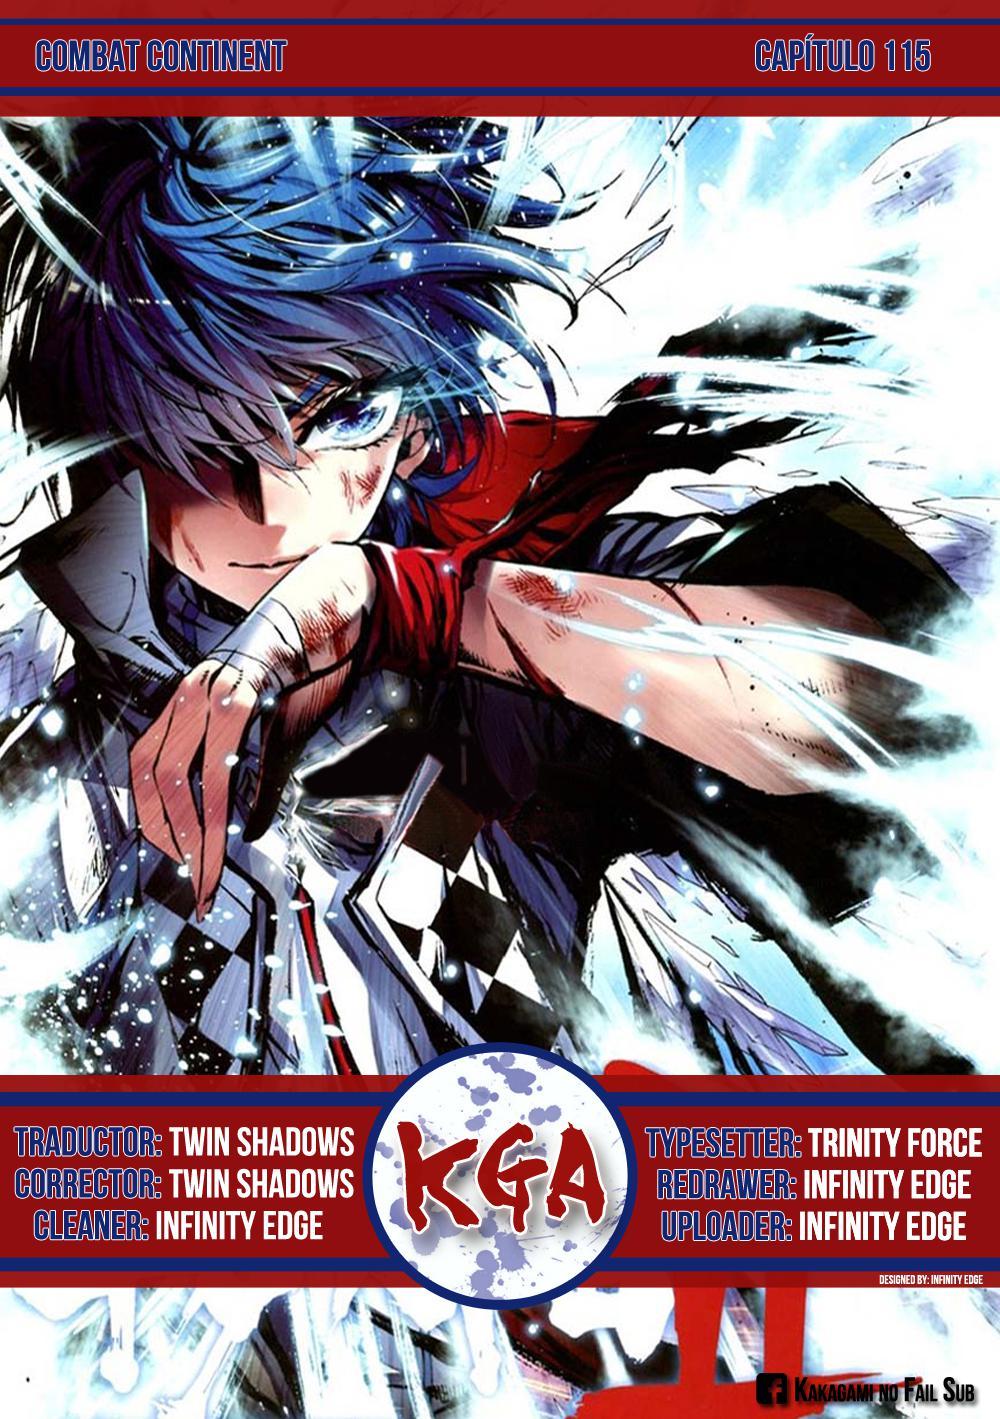 http://c5.ninemanga.com/es_manga/18/16210/417583/860f00bea9285ccc48228ff6694ba1b0.jpg Page 1